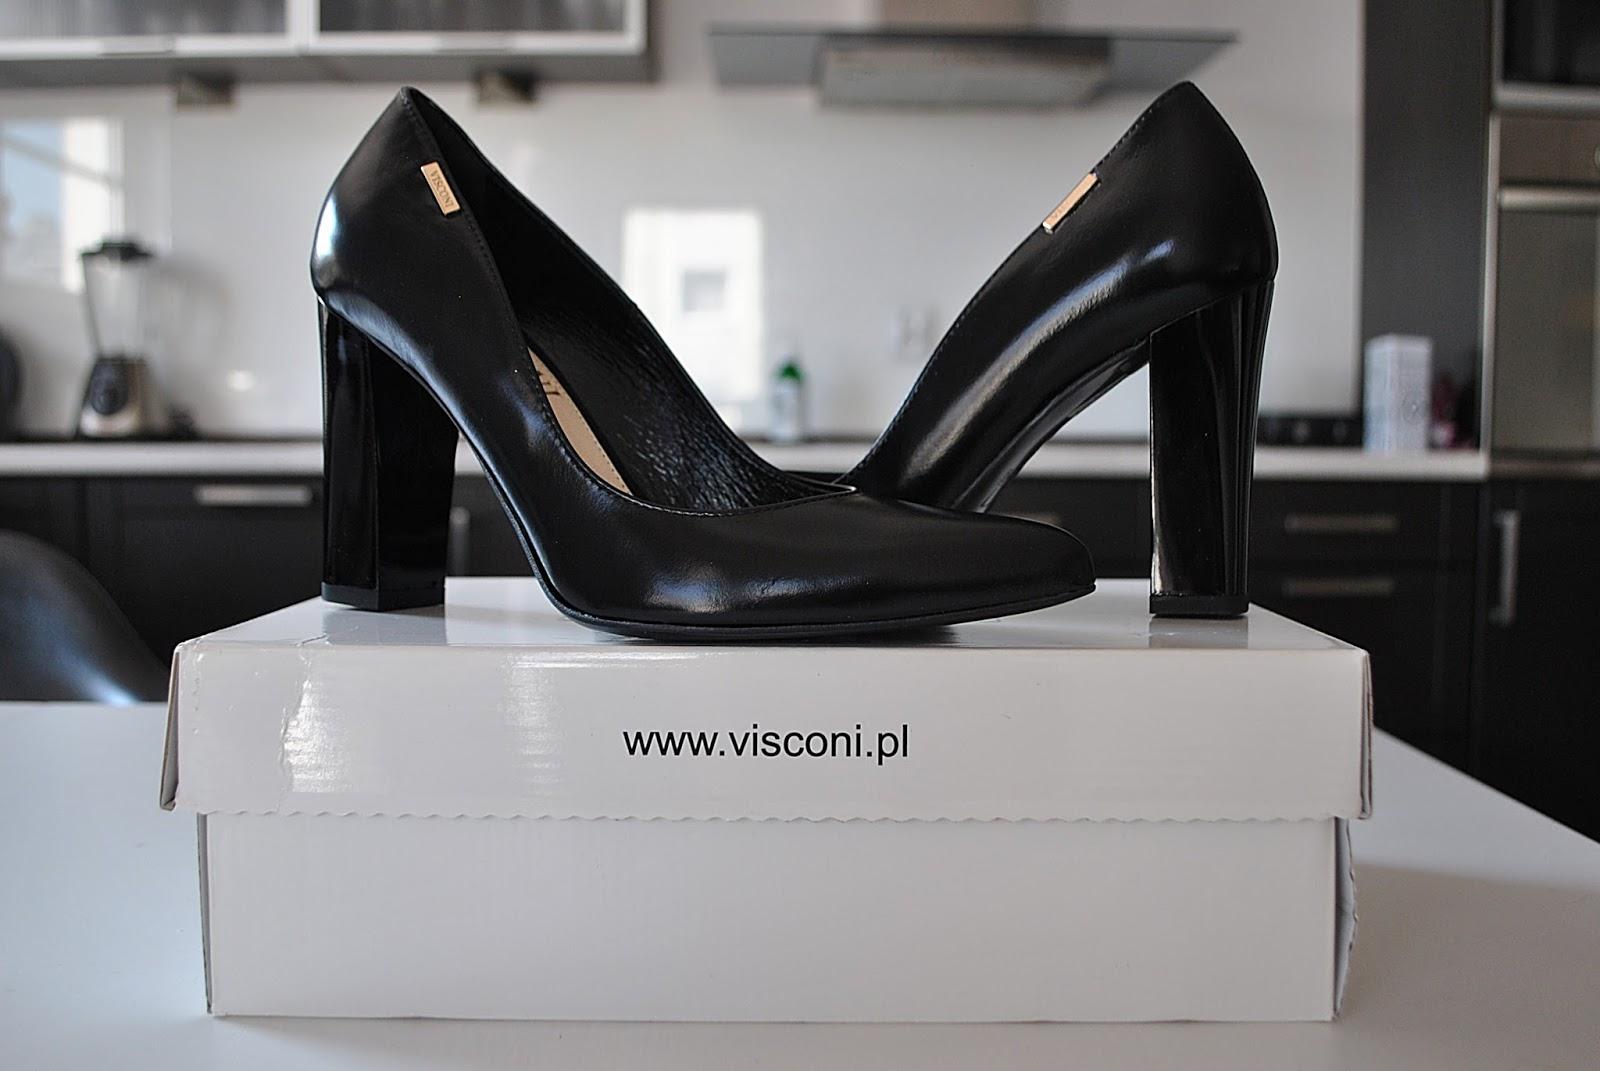 obuwie marki Visconi.